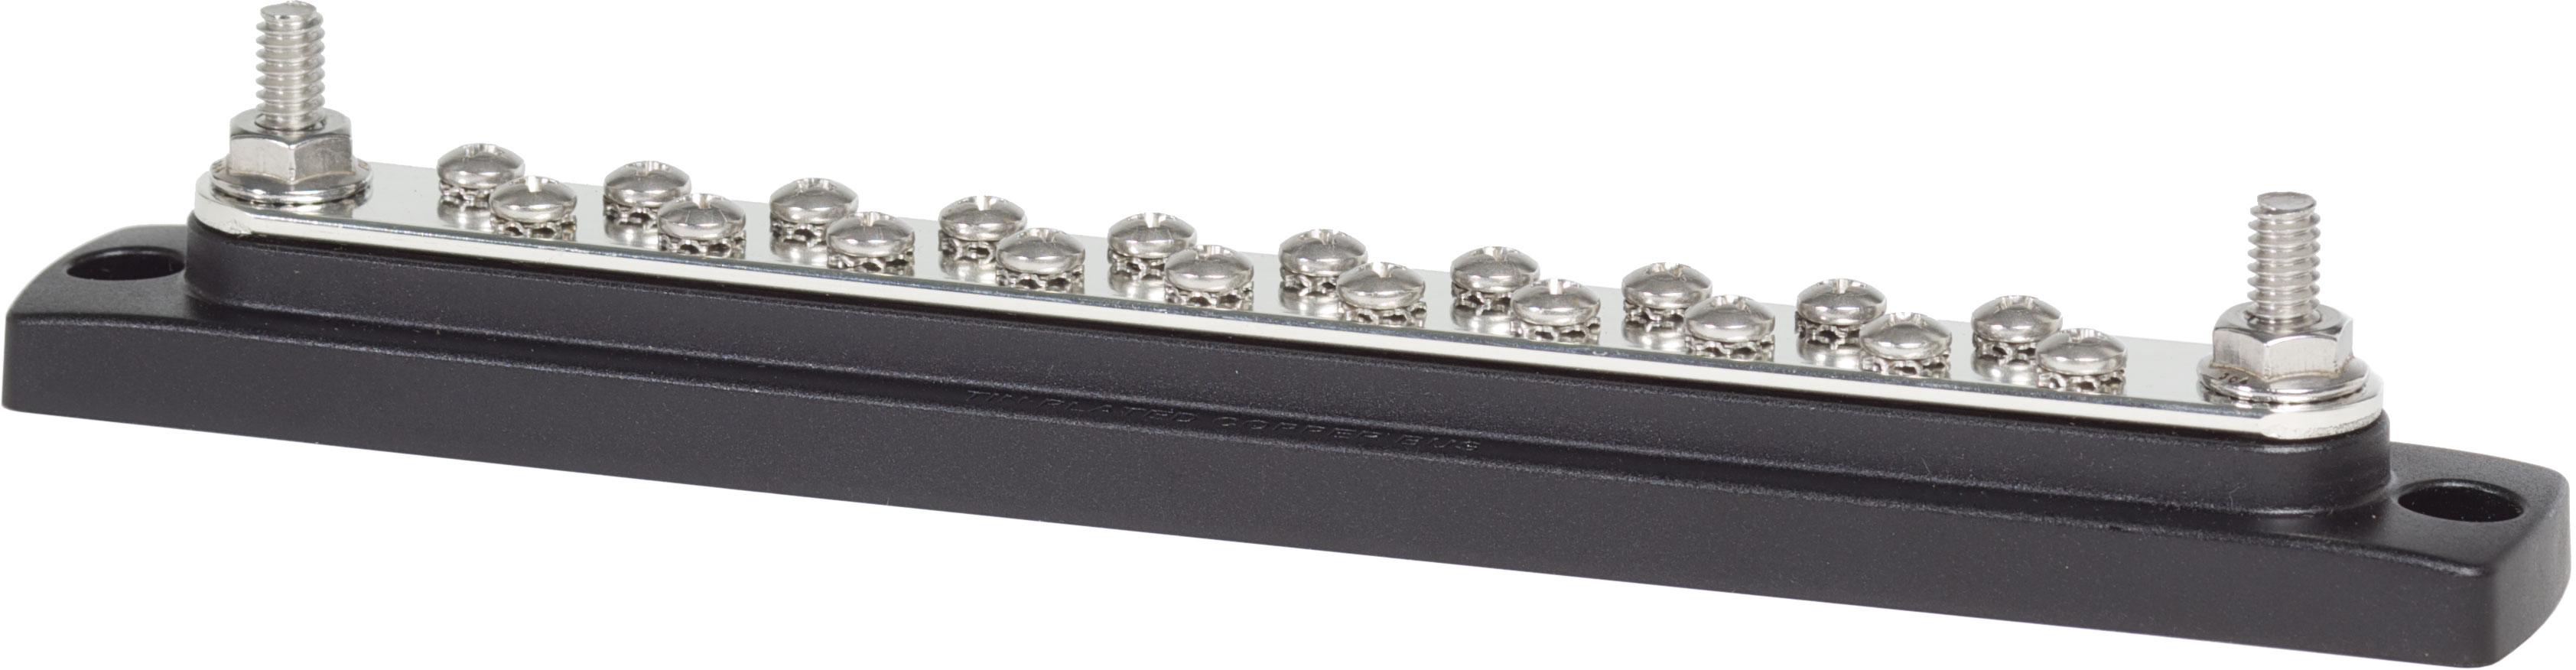 Common 150a Busbar - 20 Gang